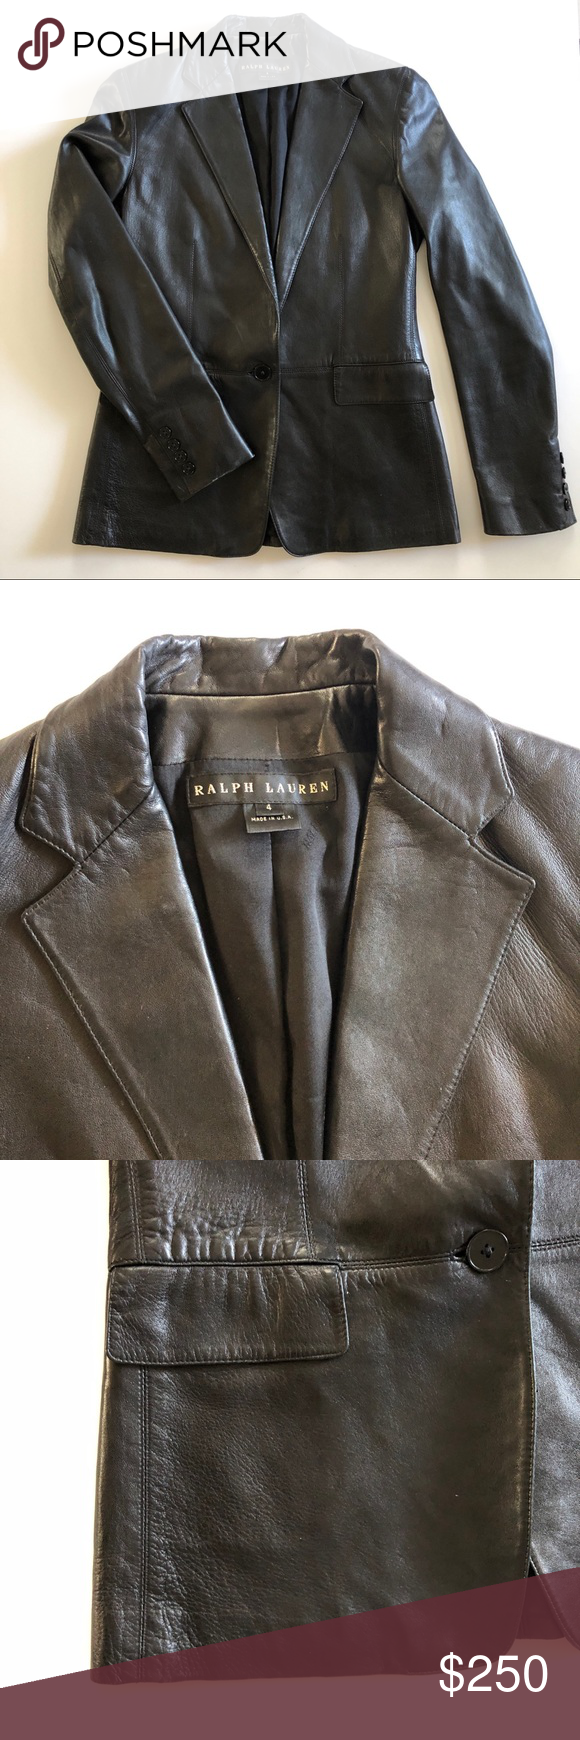 Black Ralph Lauren Lambskin Leather Blazer Jacket Lambskin Leather Blazer Leather Blazer Jacket Leather Blazer [ 1740 x 580 Pixel ]